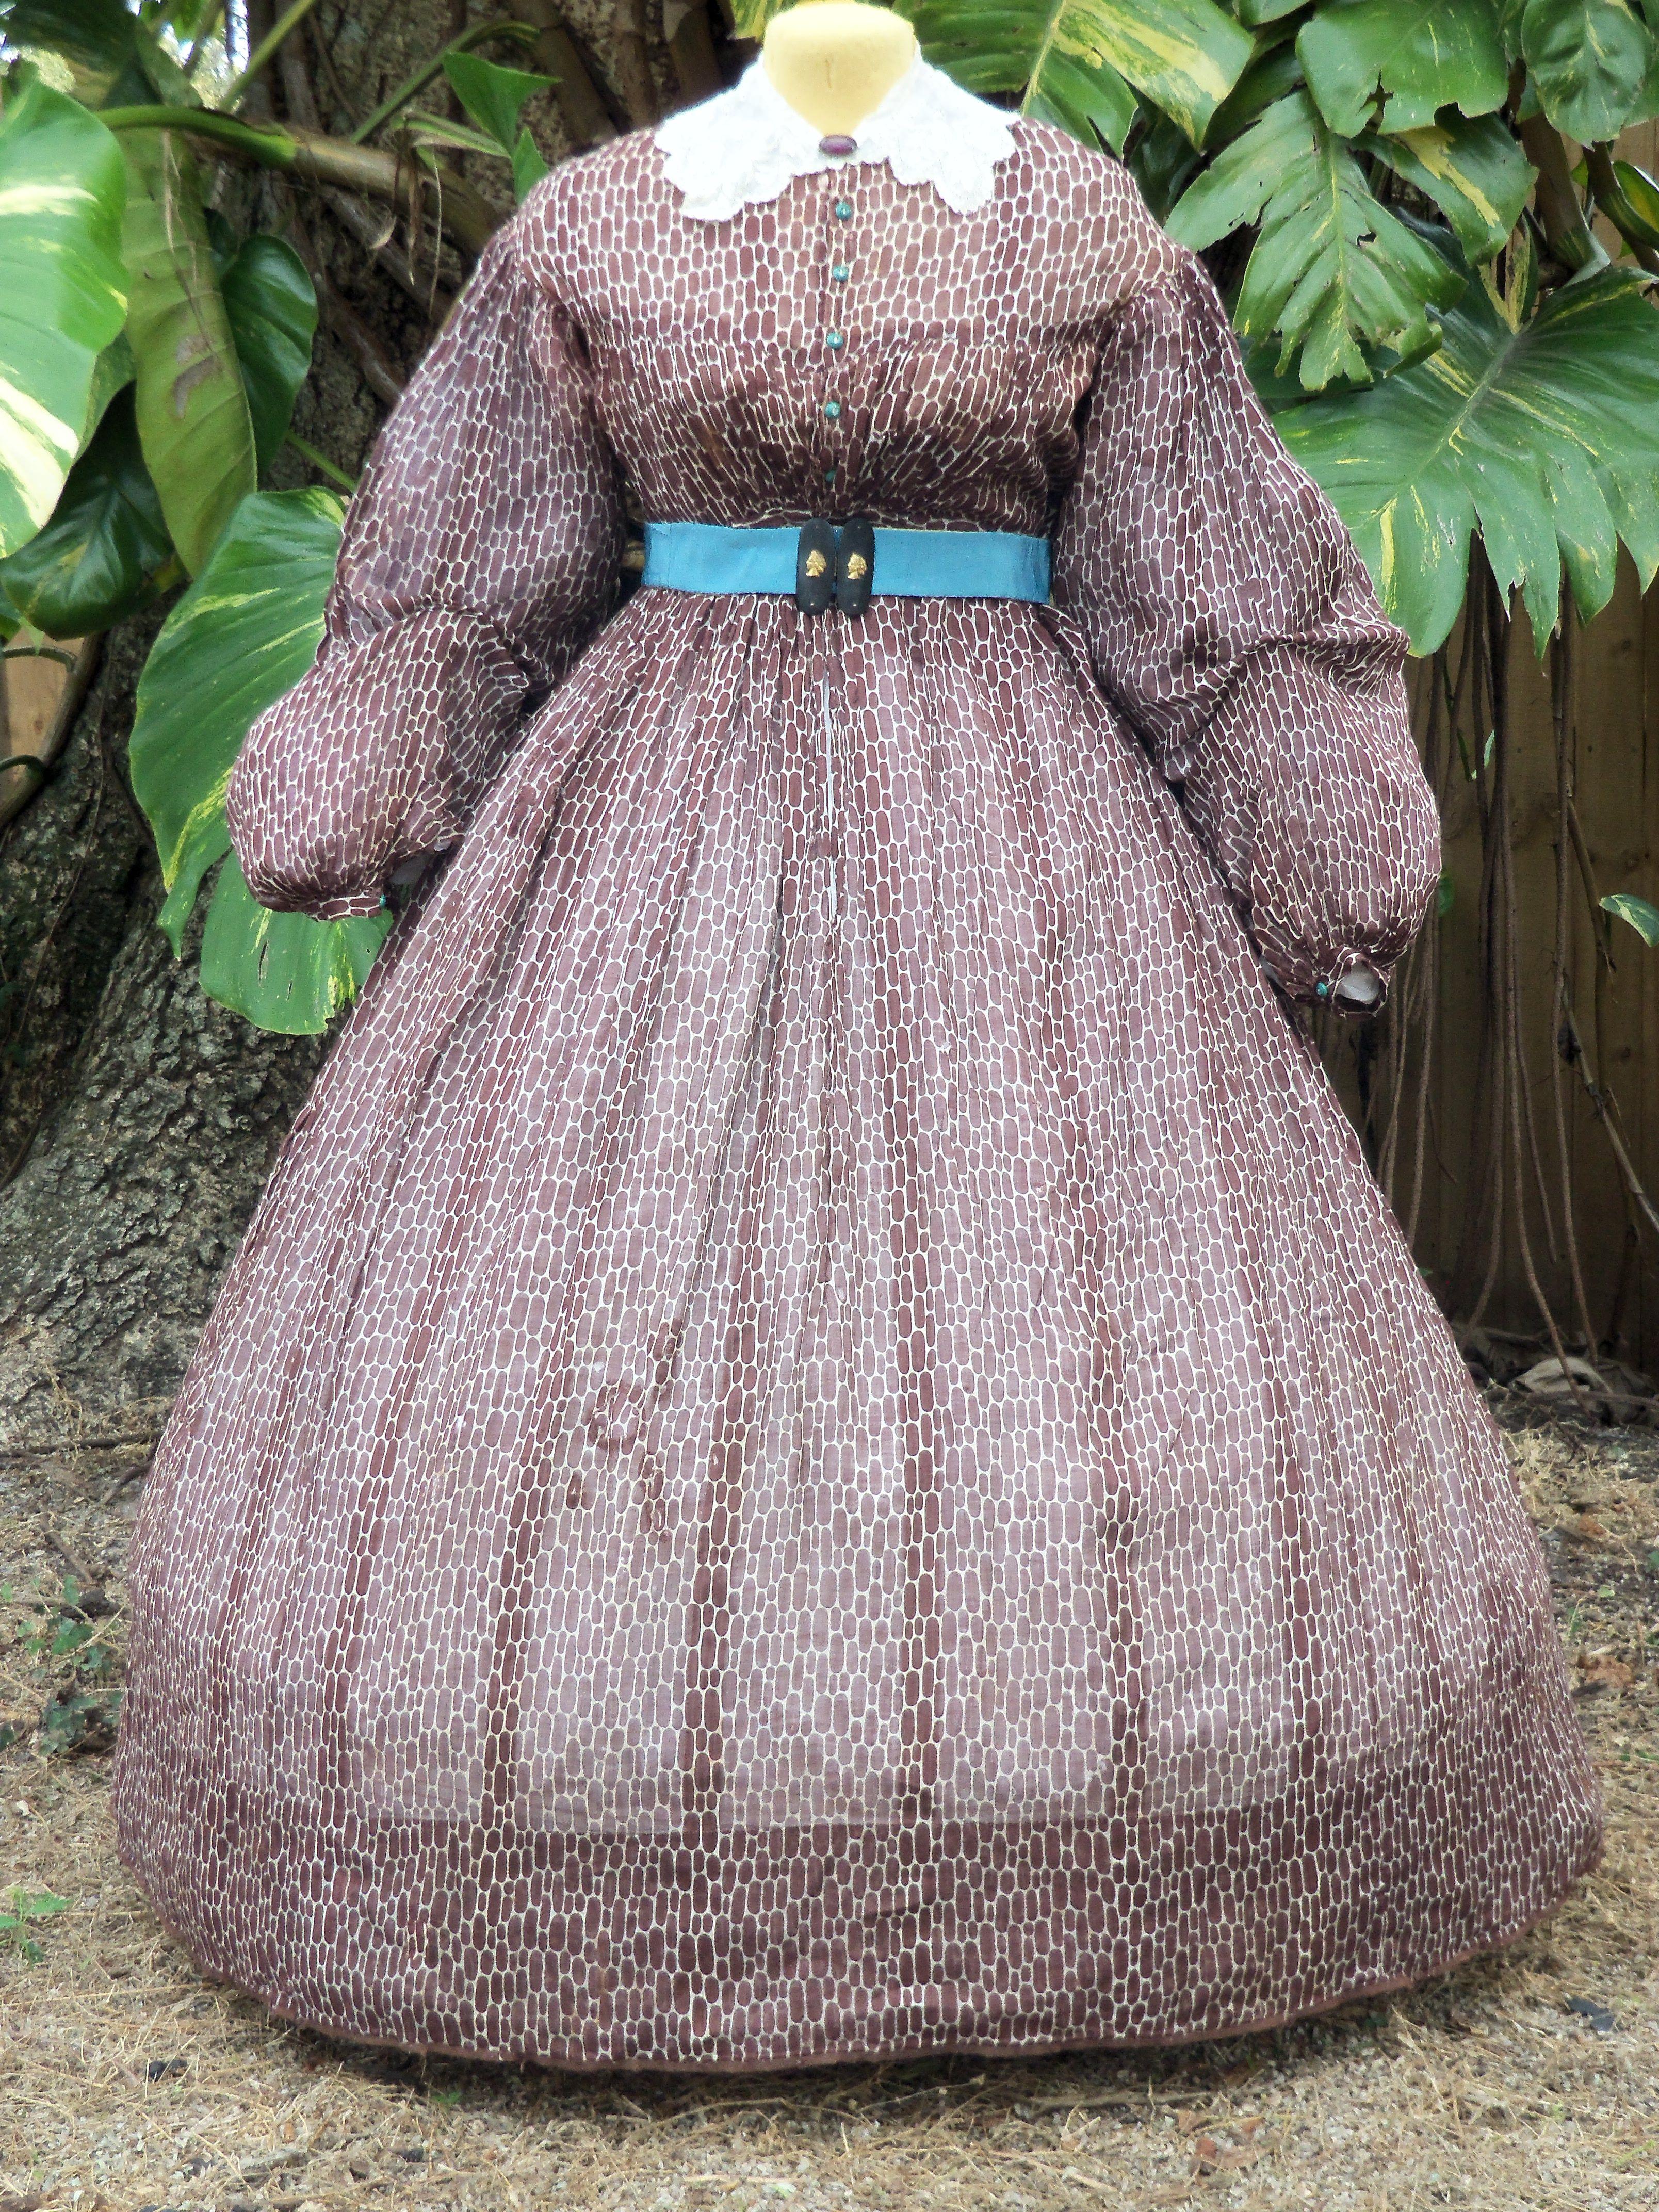 Muslin Summer Dress Updated To C 1864 5 Originally C 1860 Collection Travis Triplett Sheer Dress Mid Dresses Dresses [ 4288 x 3216 Pixel ]